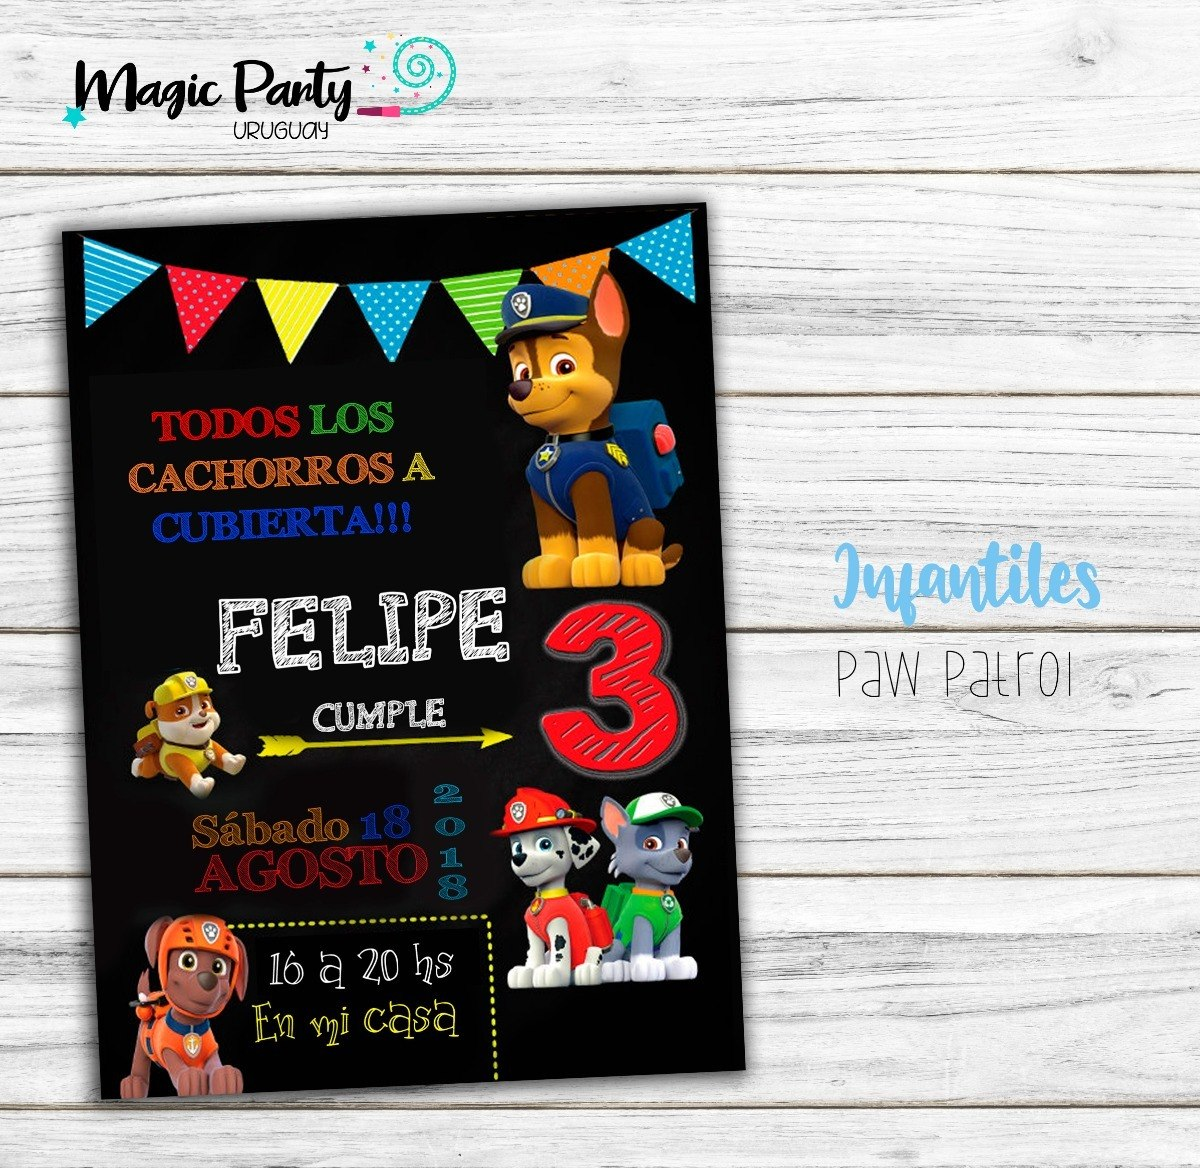 Tarjeta Invitación Digital Paw Patrol Patrulla Canina